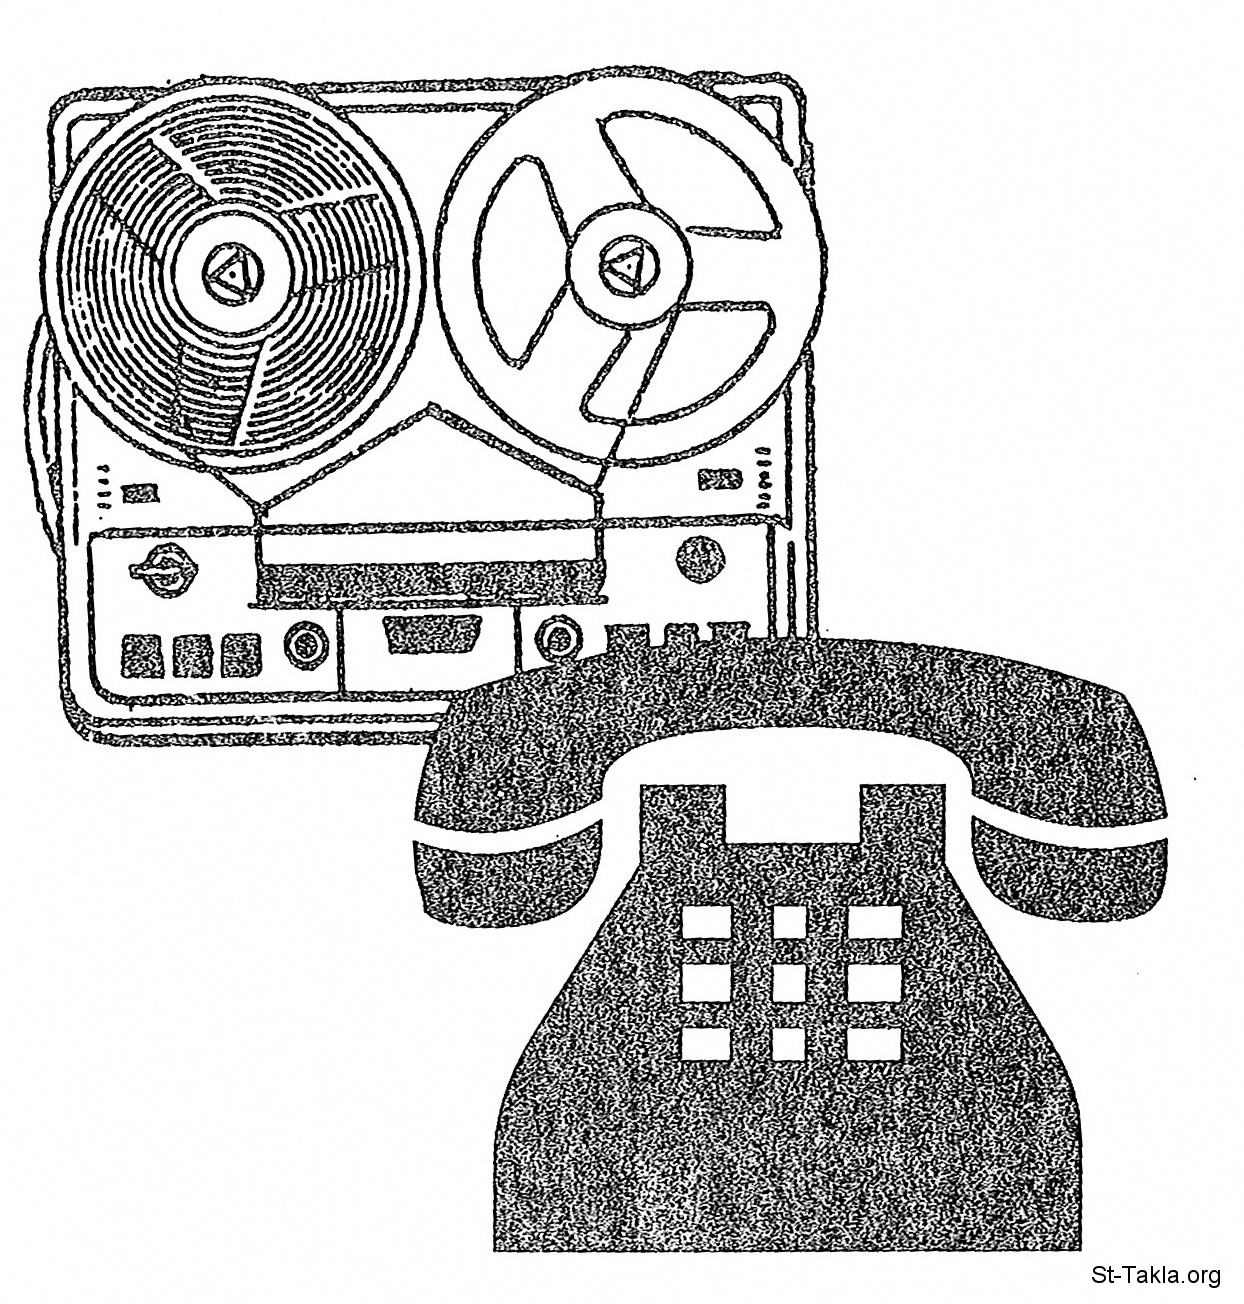 Image: Phone Record صورة تليفون، مسجل